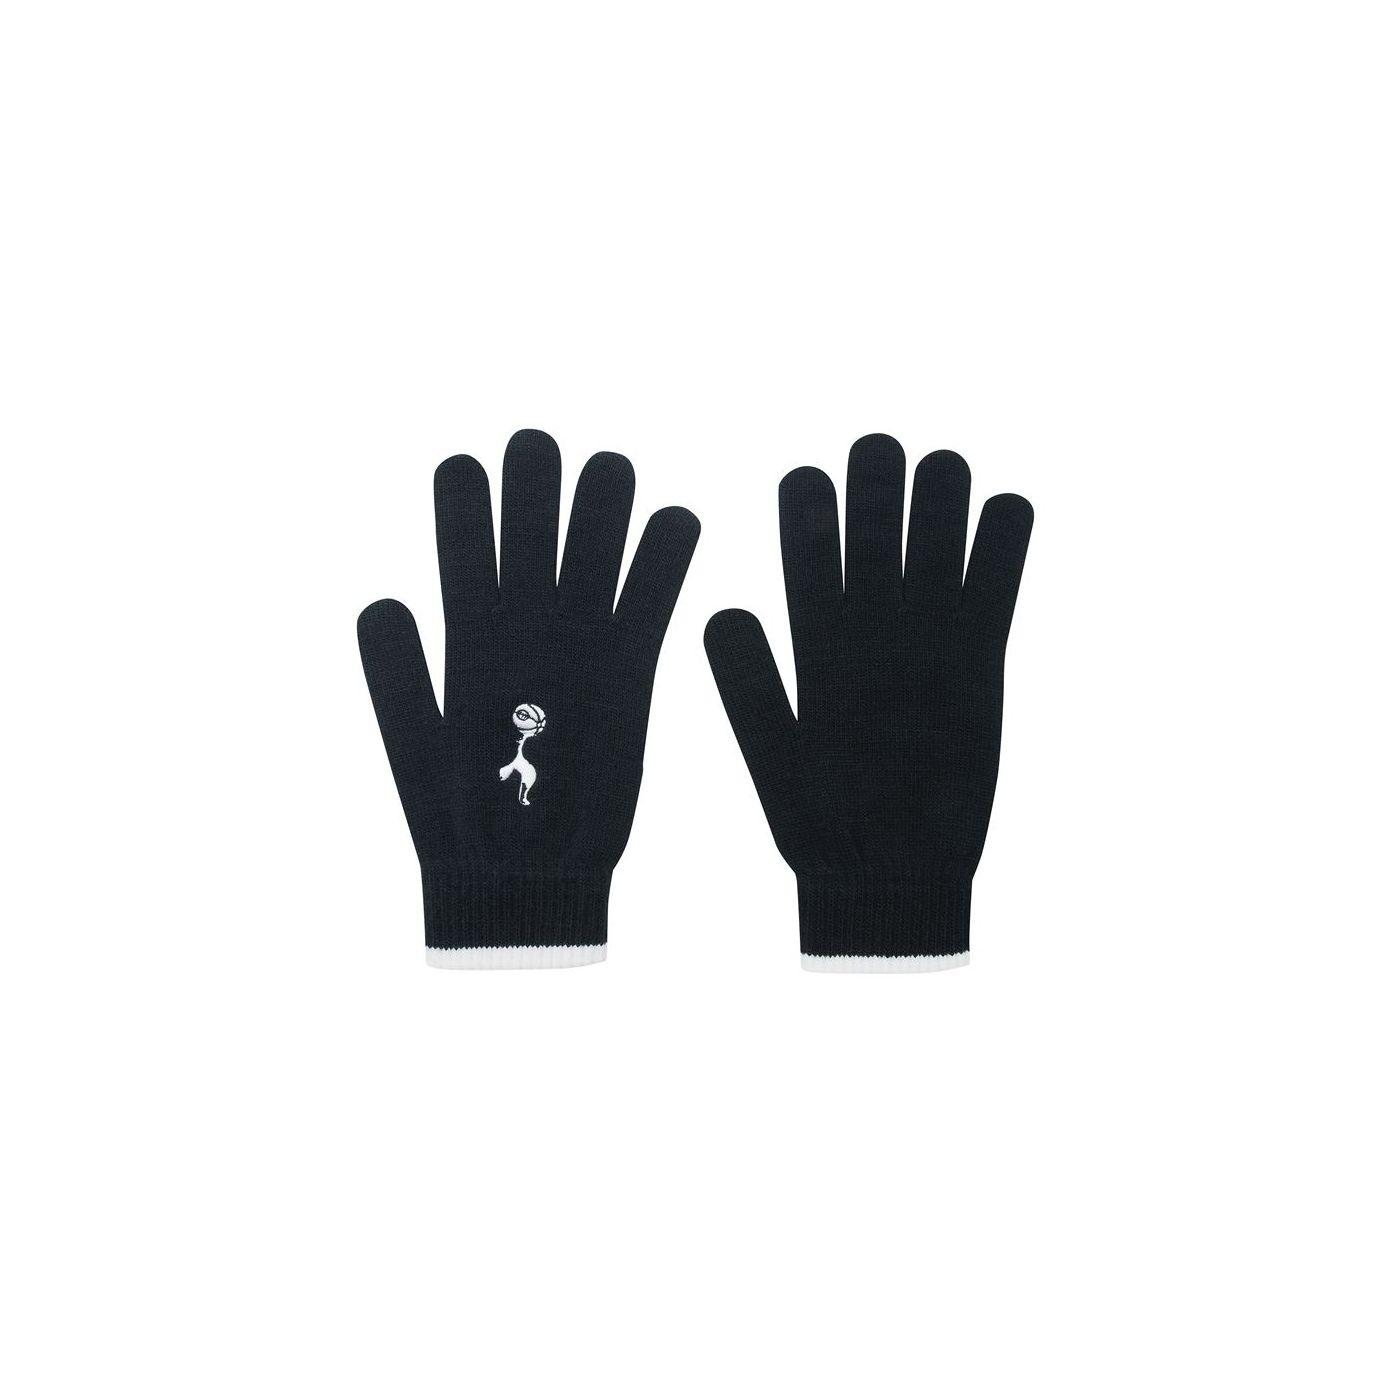 Team Knit Glove Jnr64